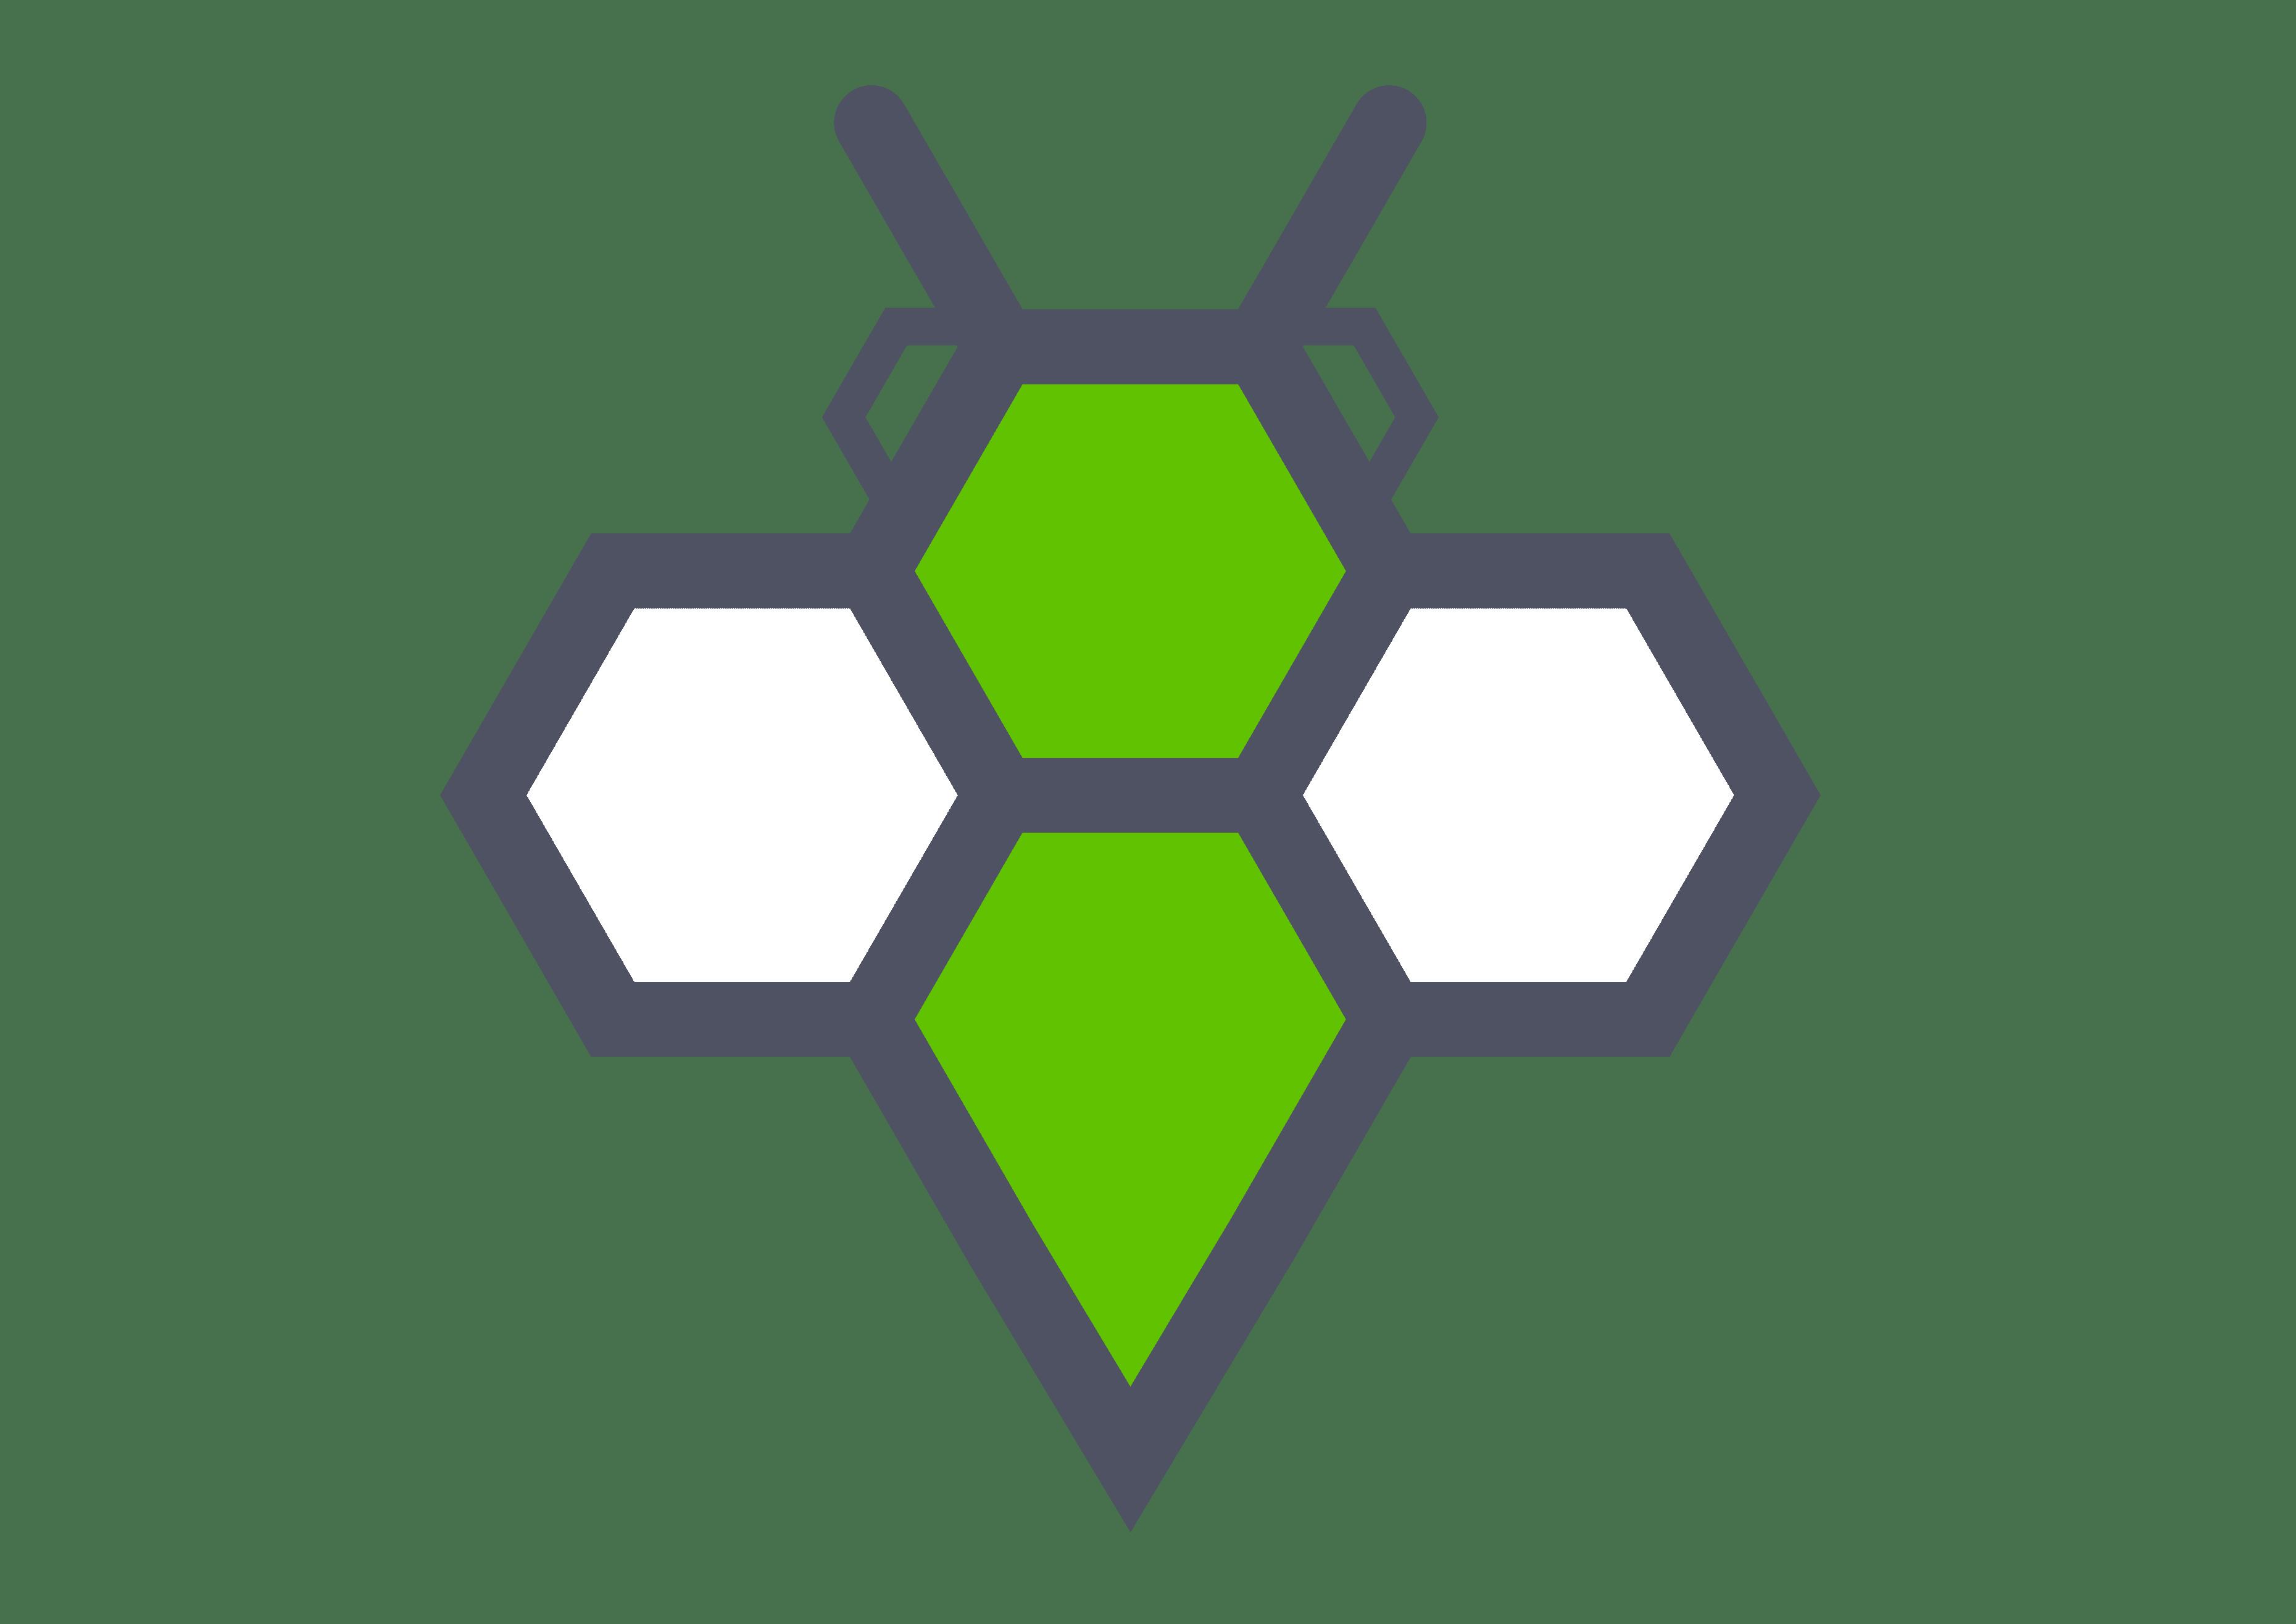 #151 – Introduction to StorageOS V2.0 (Sponsored)